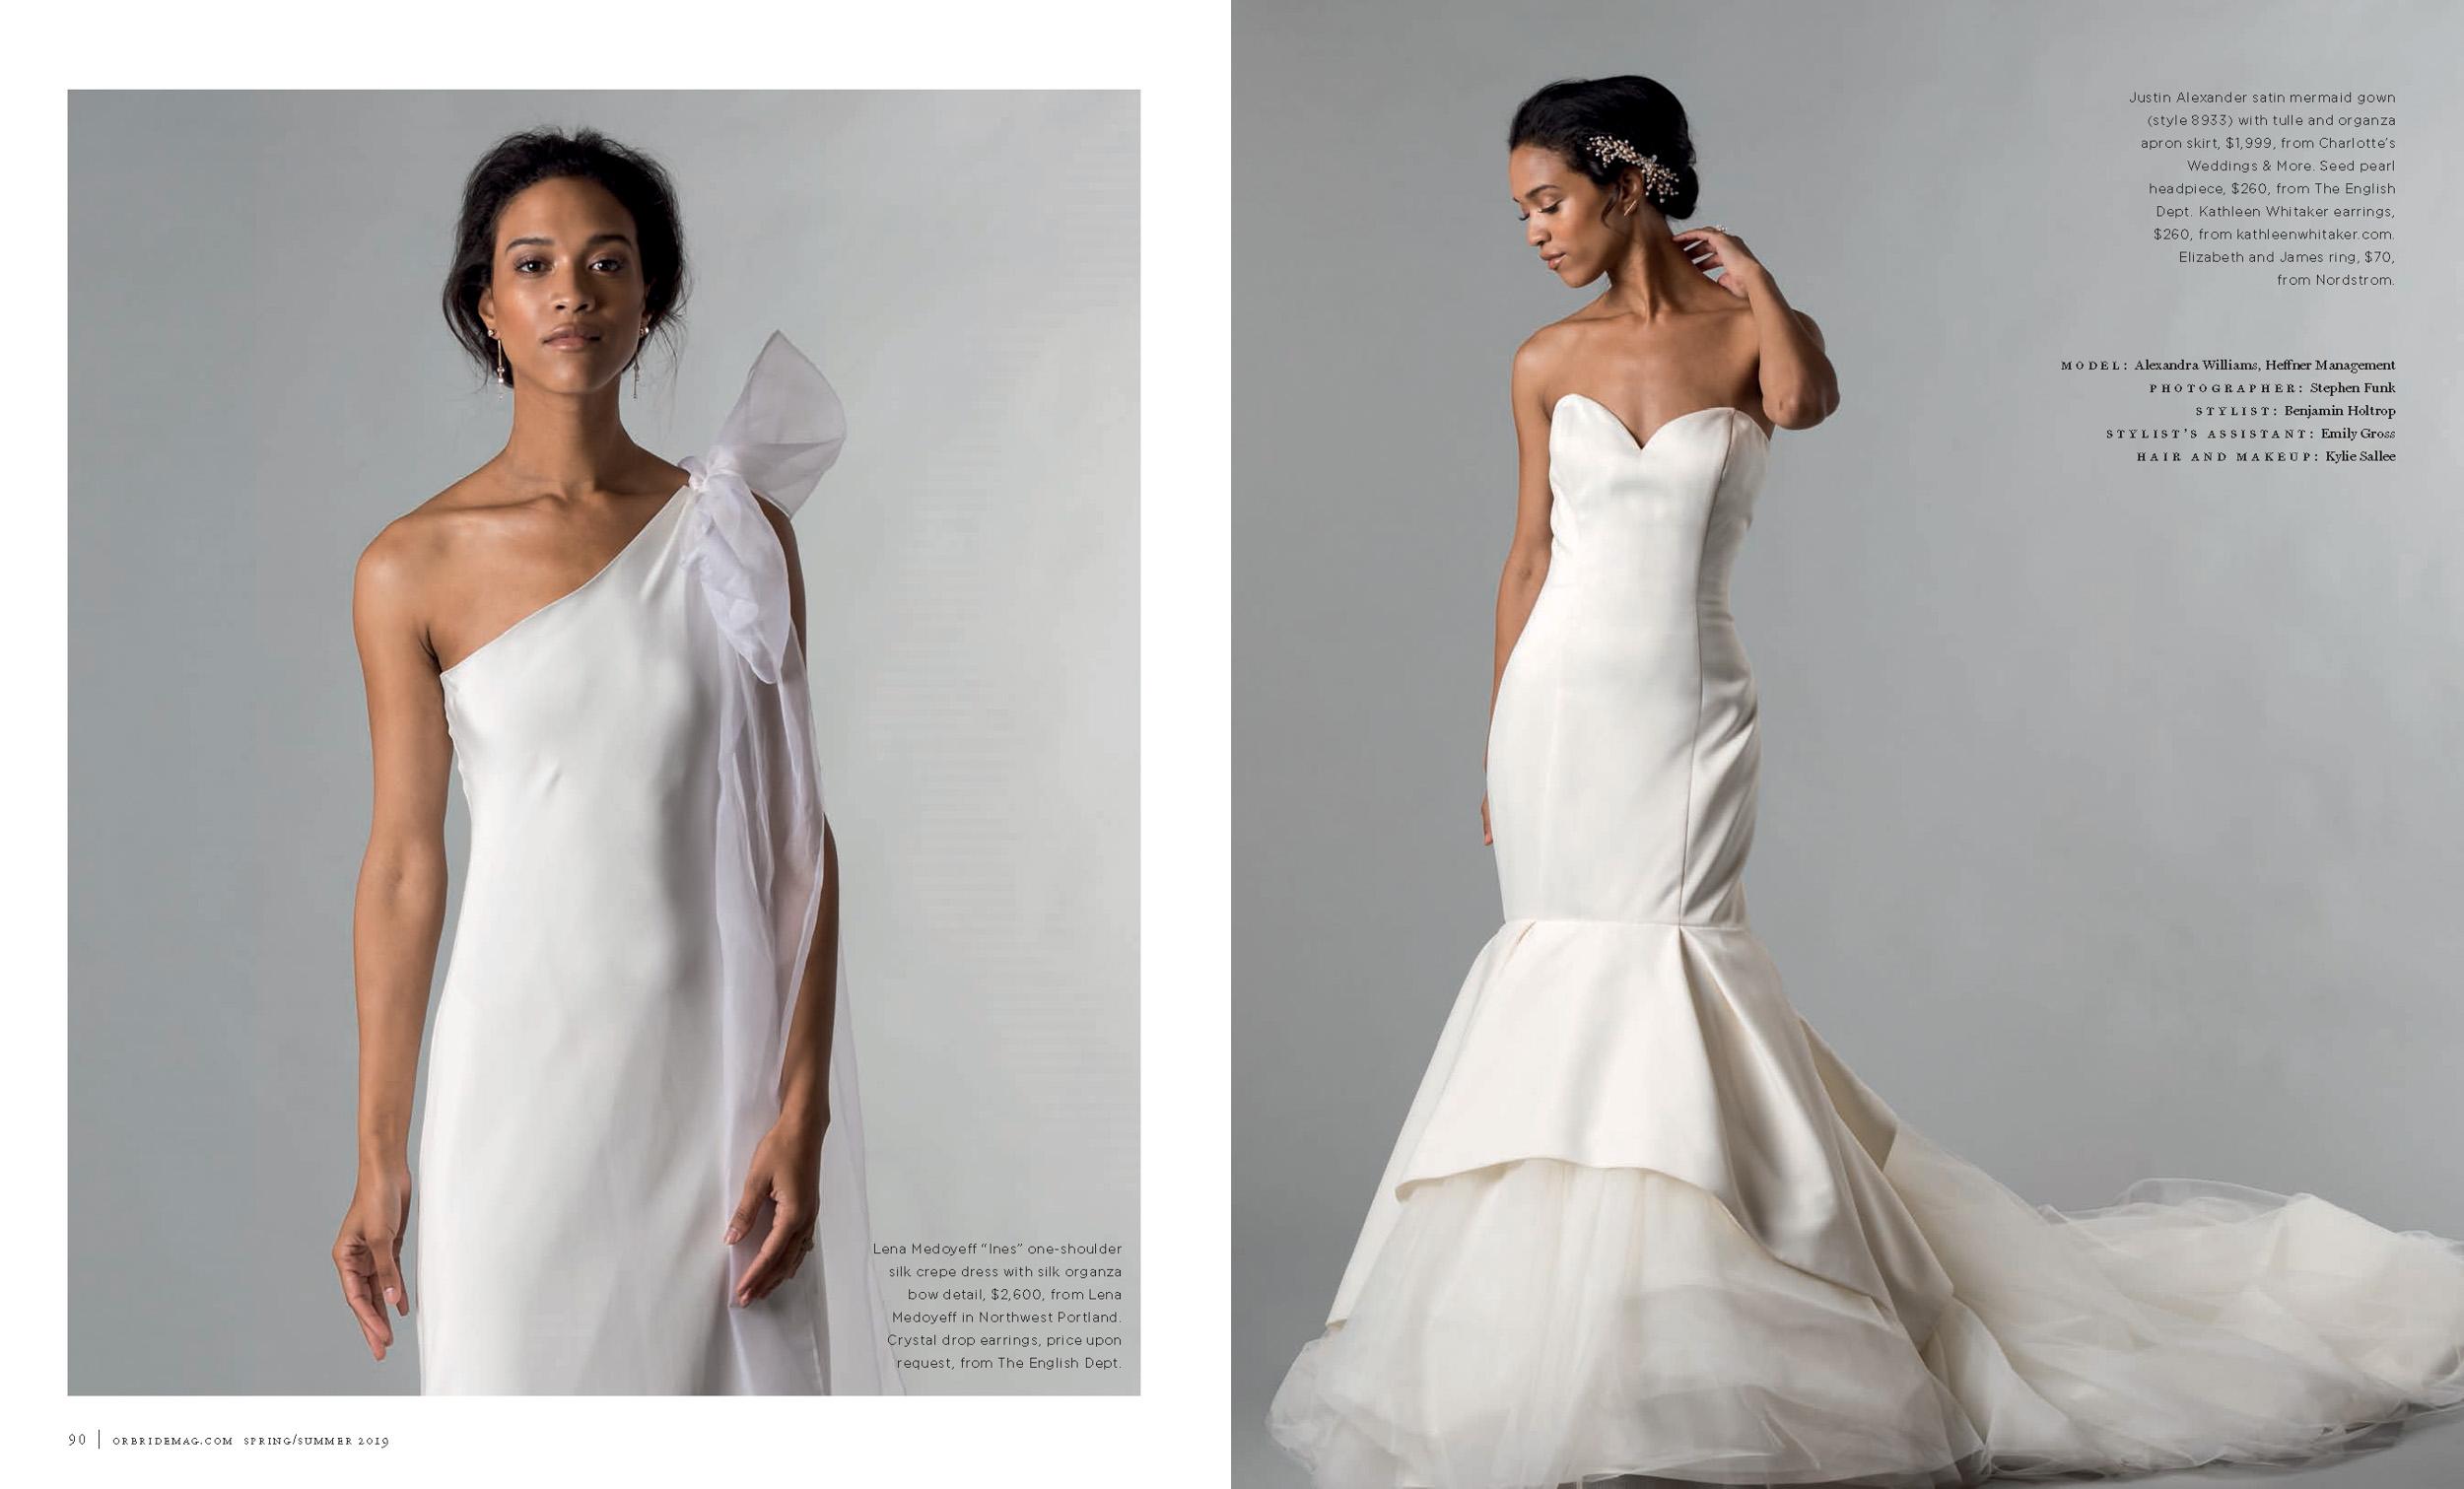 fashion-photography-OBR_SS19_Fashion2A_Page_5.jpg